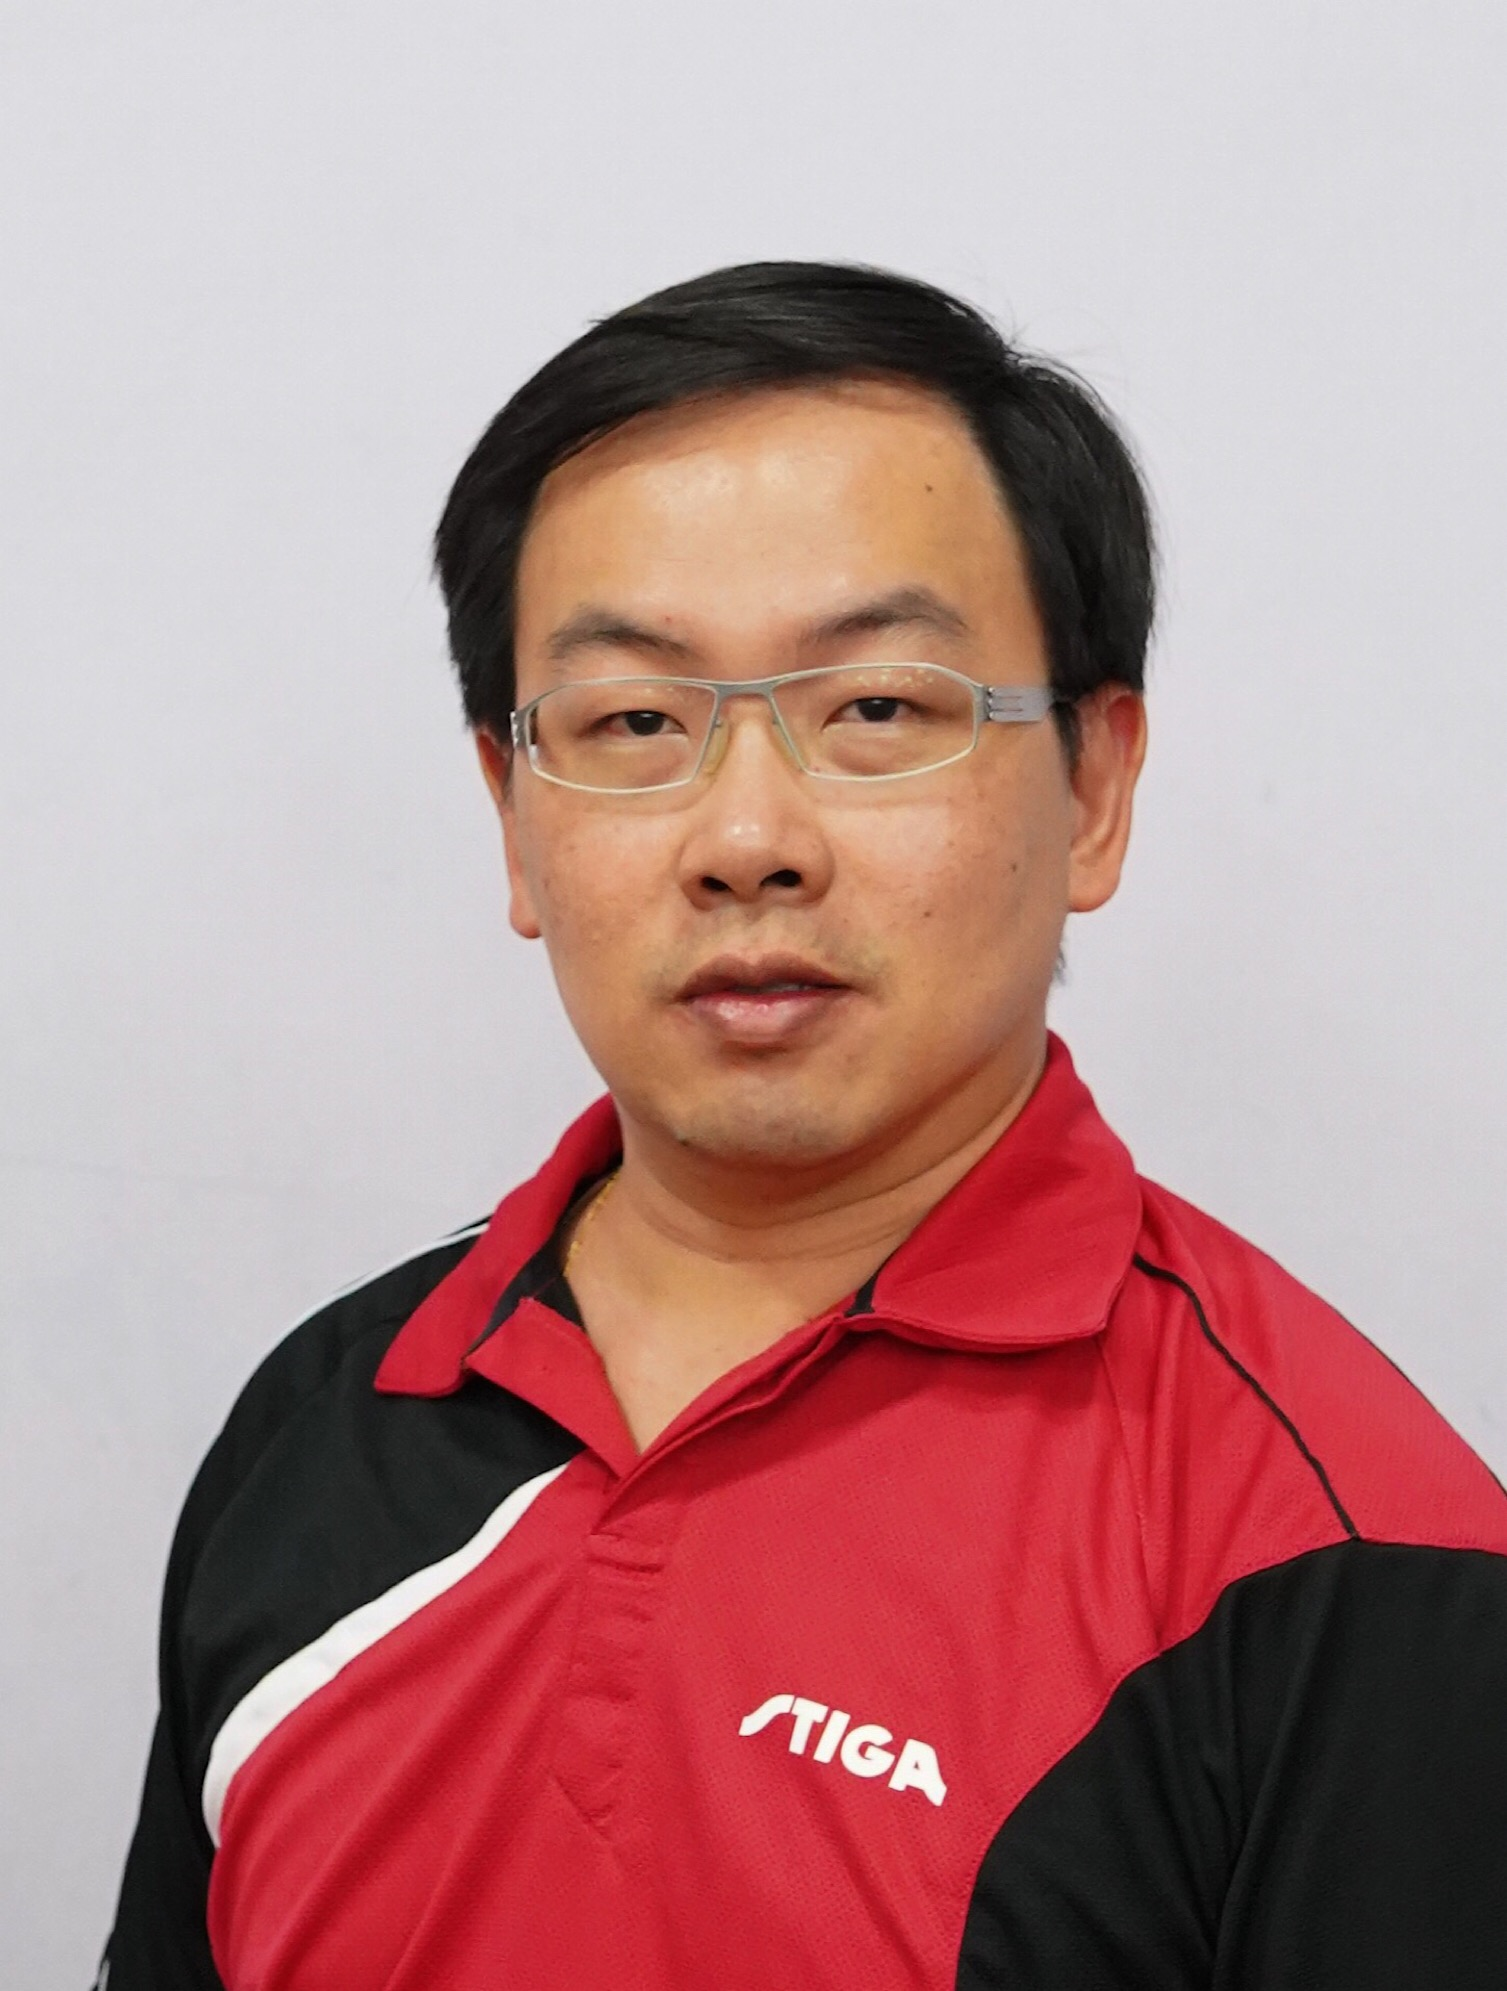 Eddy Tay Han Chong